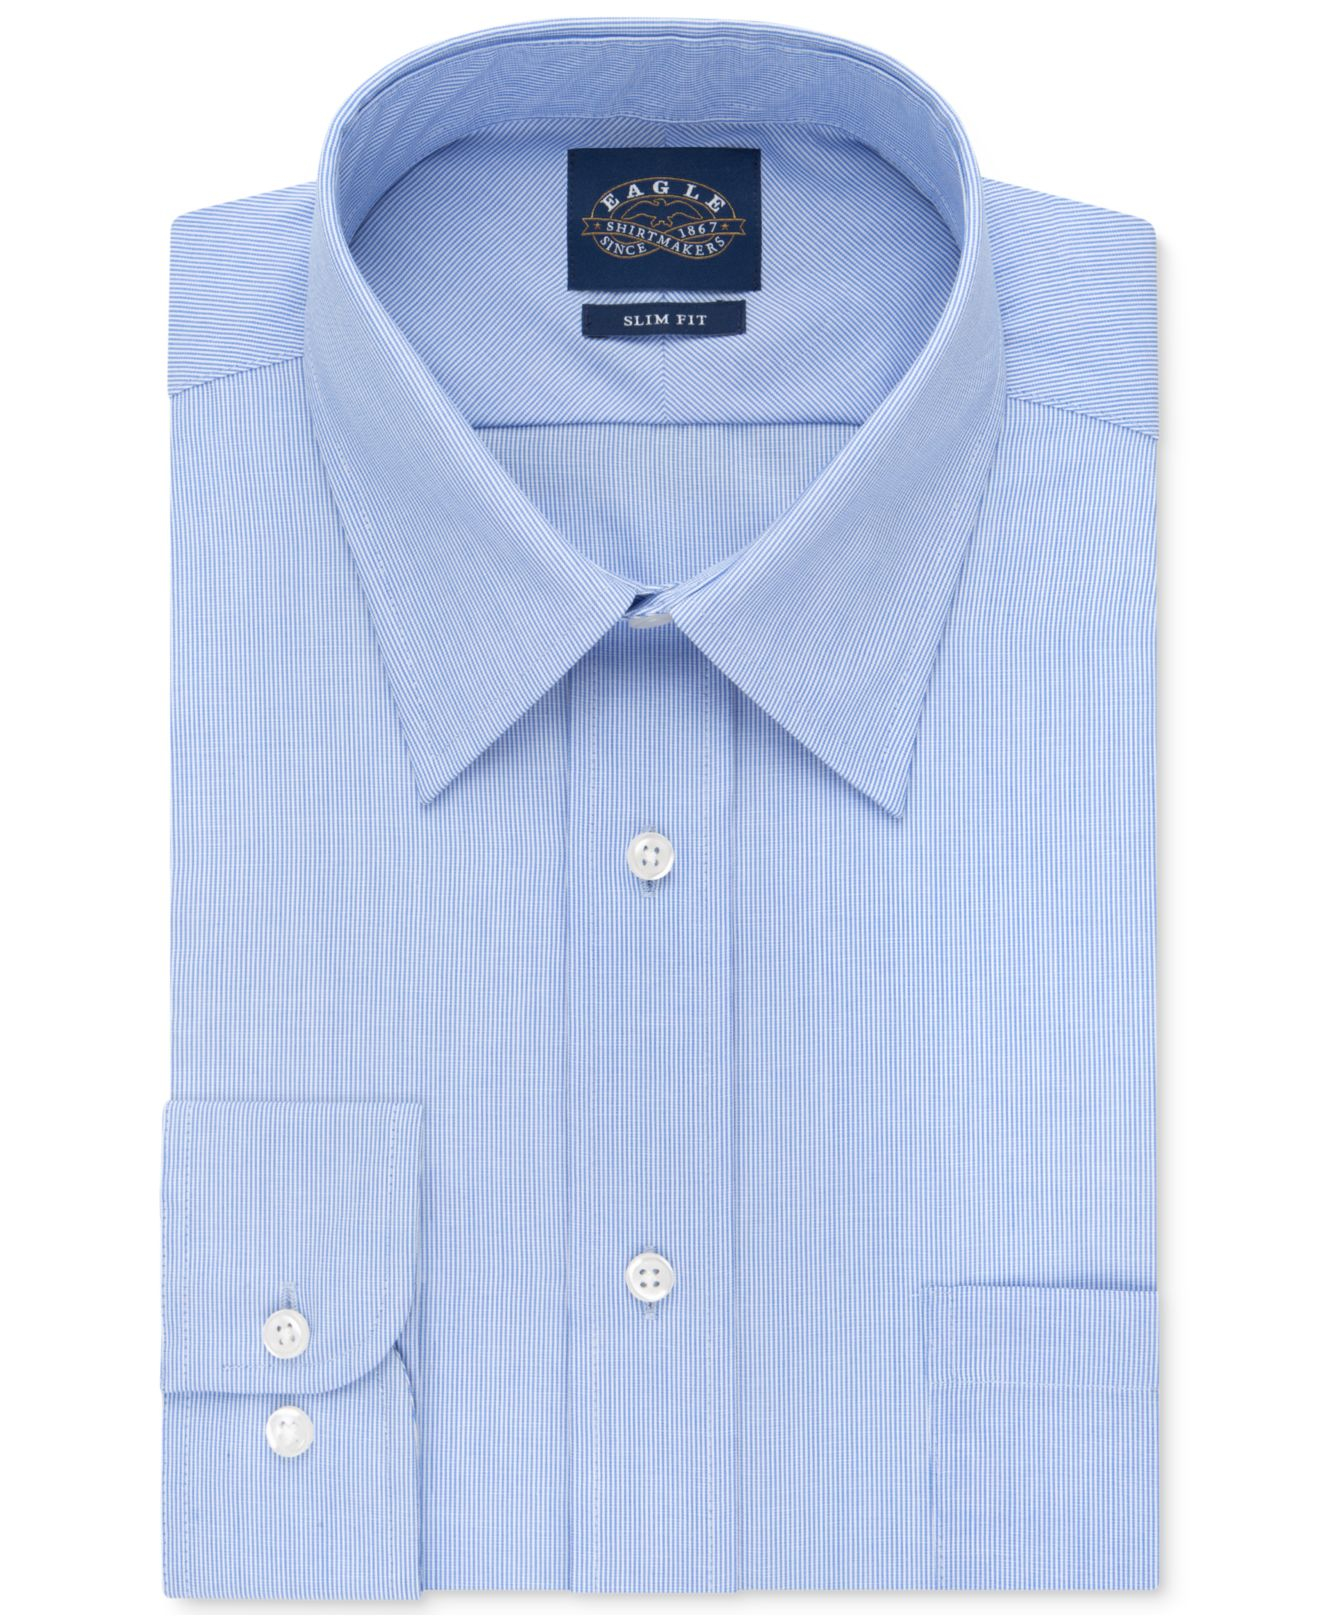 Eagle men 39 s slim fit non iron blue crystal micro stripe for Slim fit non iron shirts